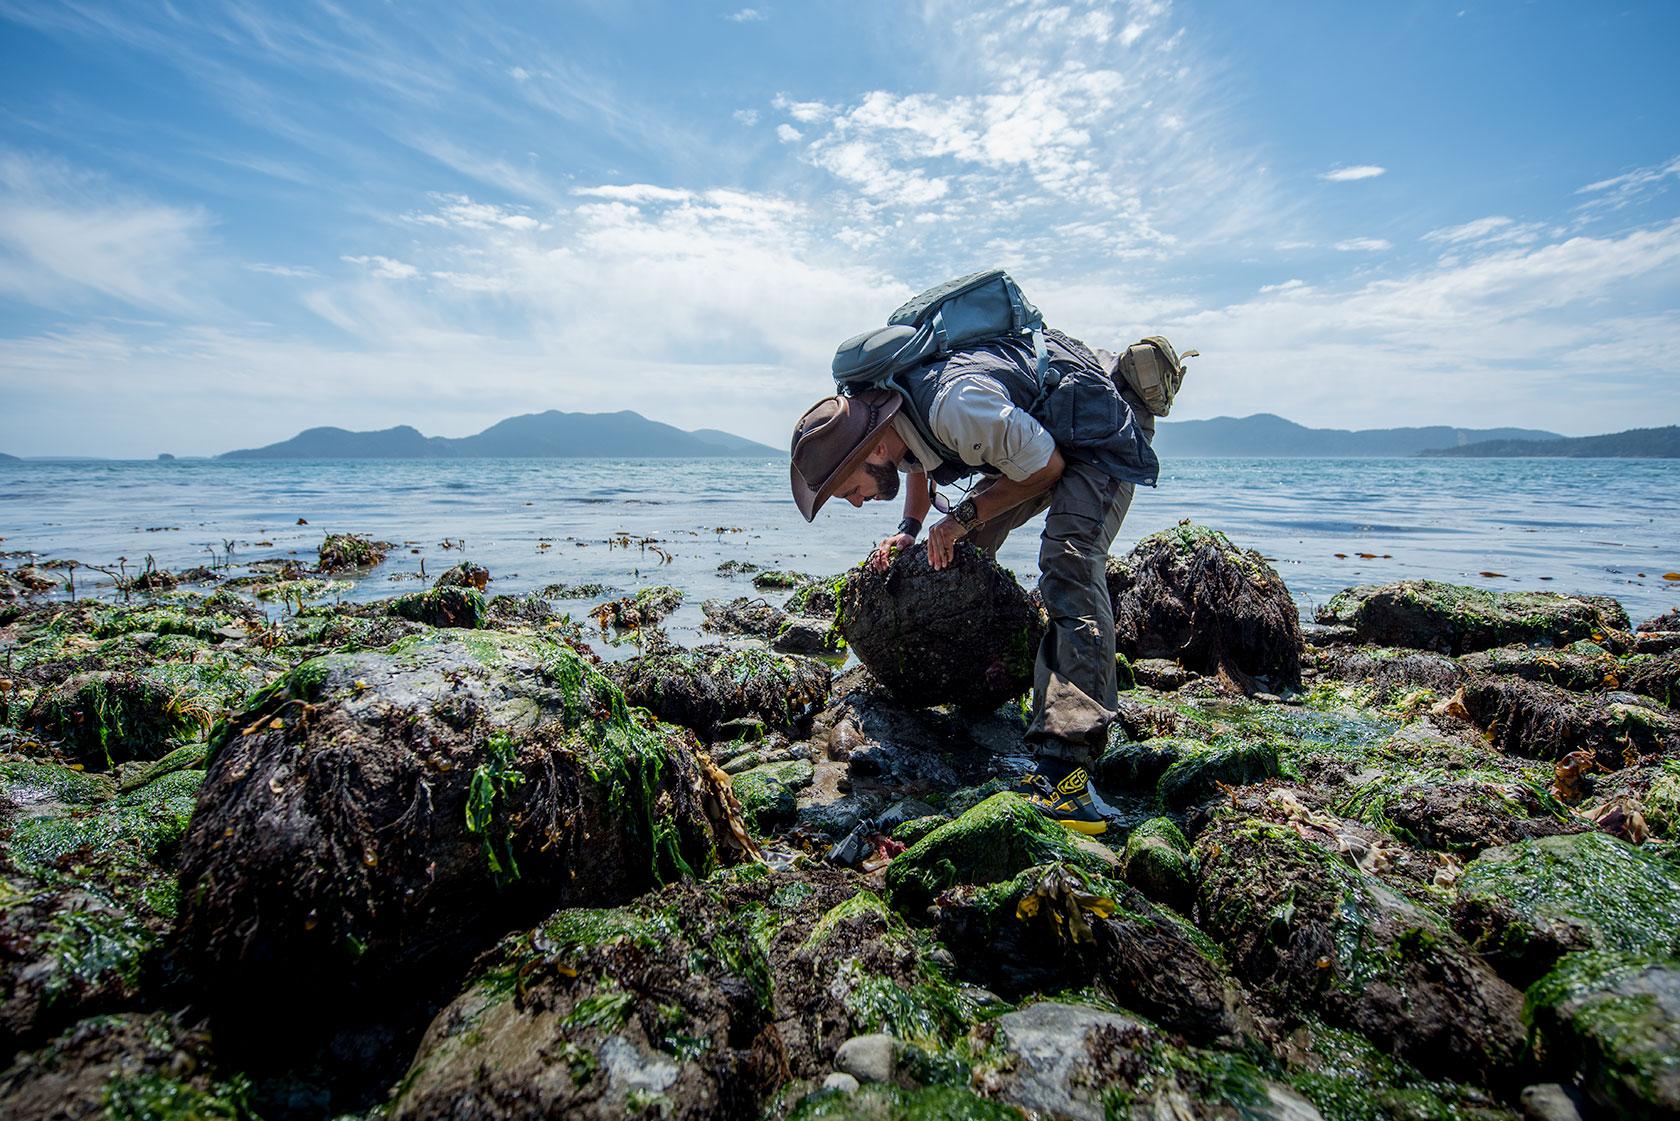 austin-trigg-brave-wilderness-orcas-island-tide-pool-rock-turn-over.jpg